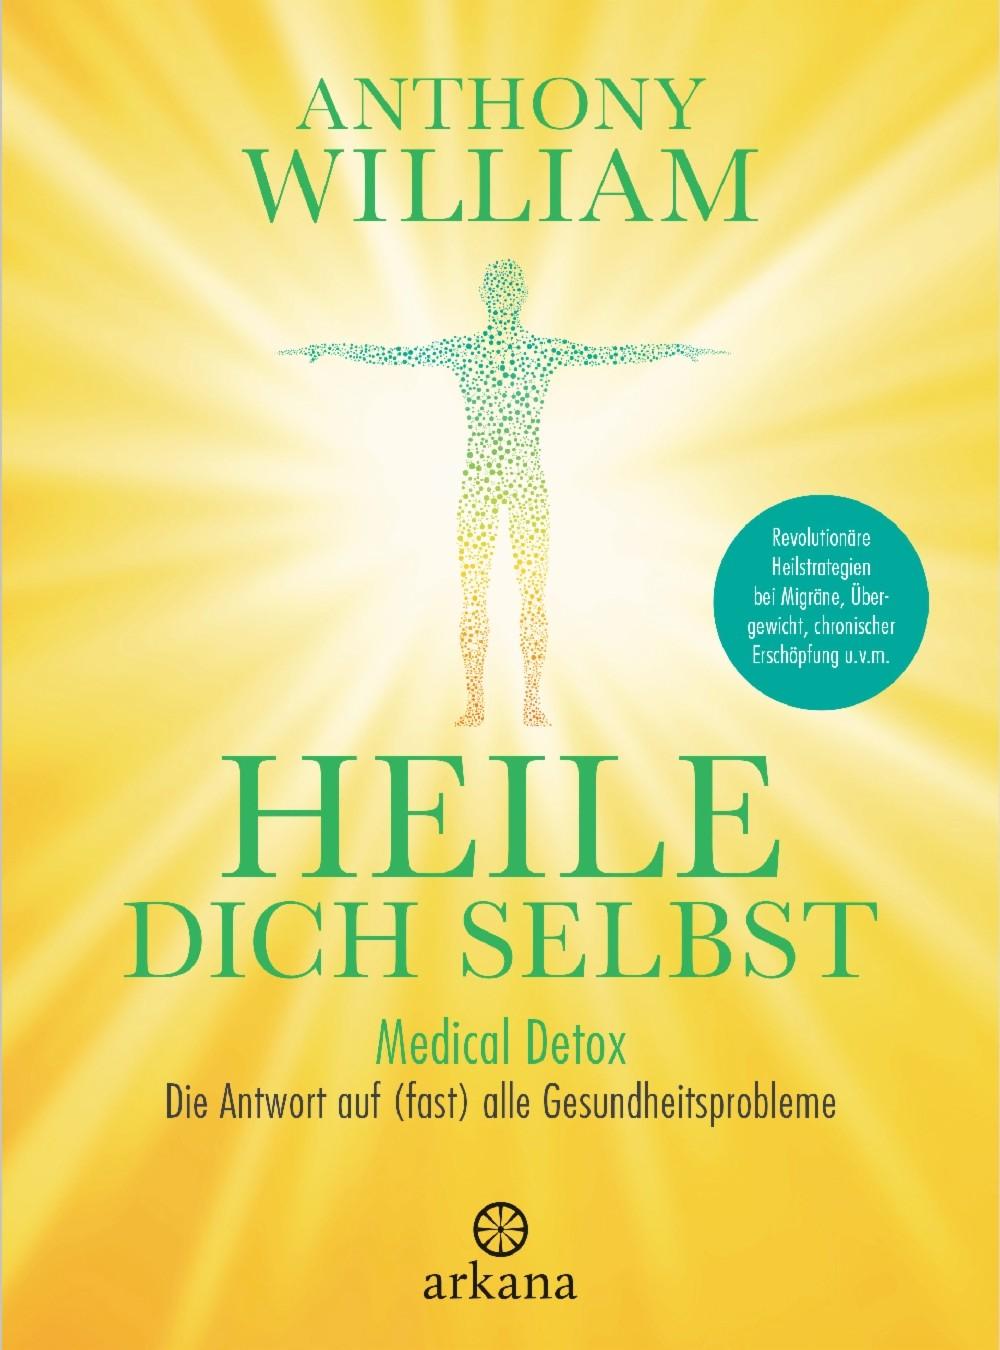 Heile dich selbst Anthony William ARKANA Verlag Hardcover NEU